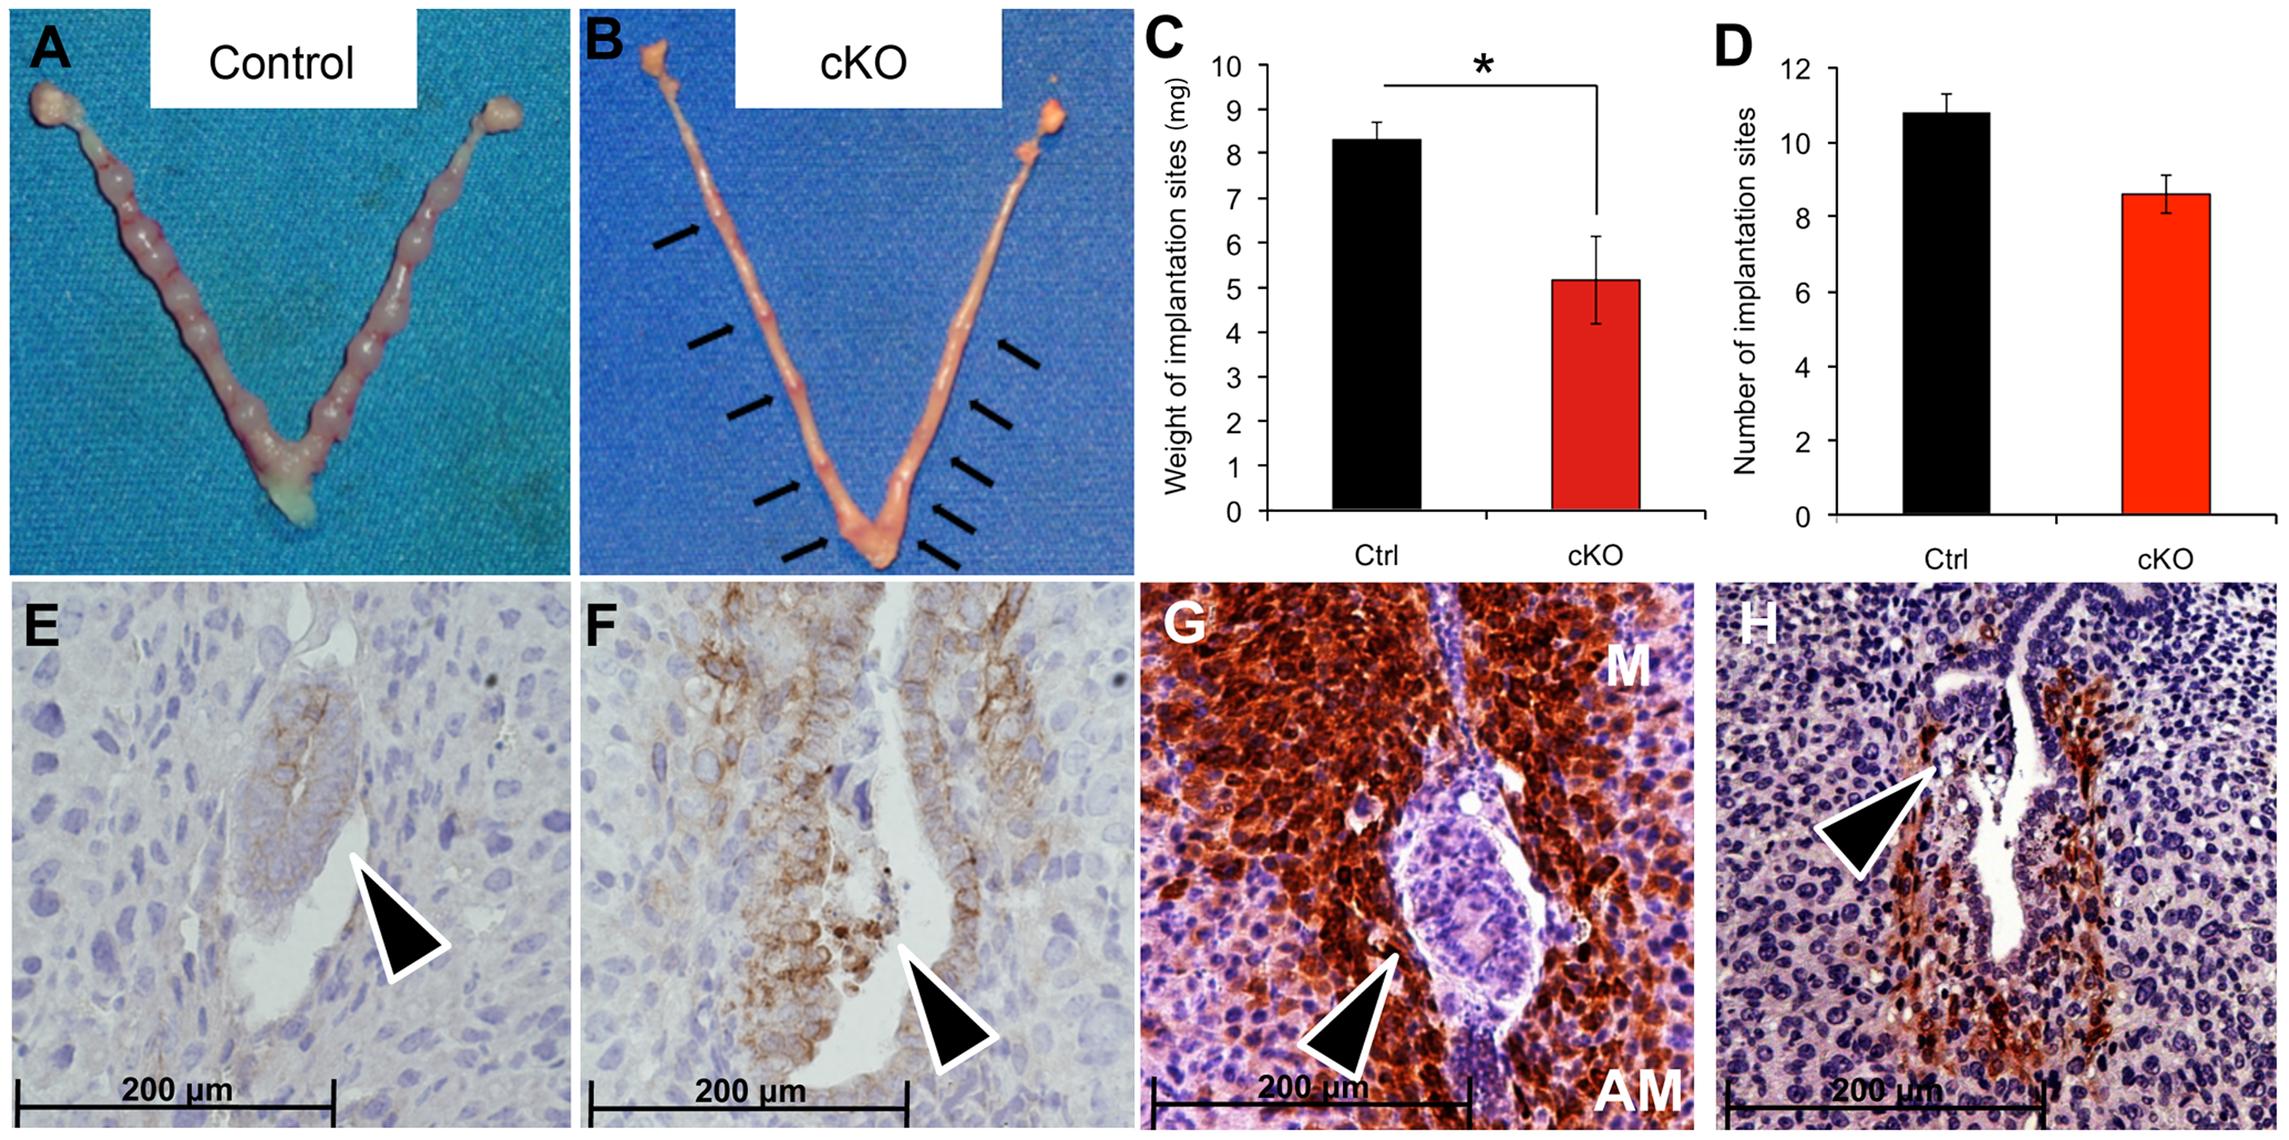 Delayed blastocyst invasion in cKO mice at 5.5 dpc.